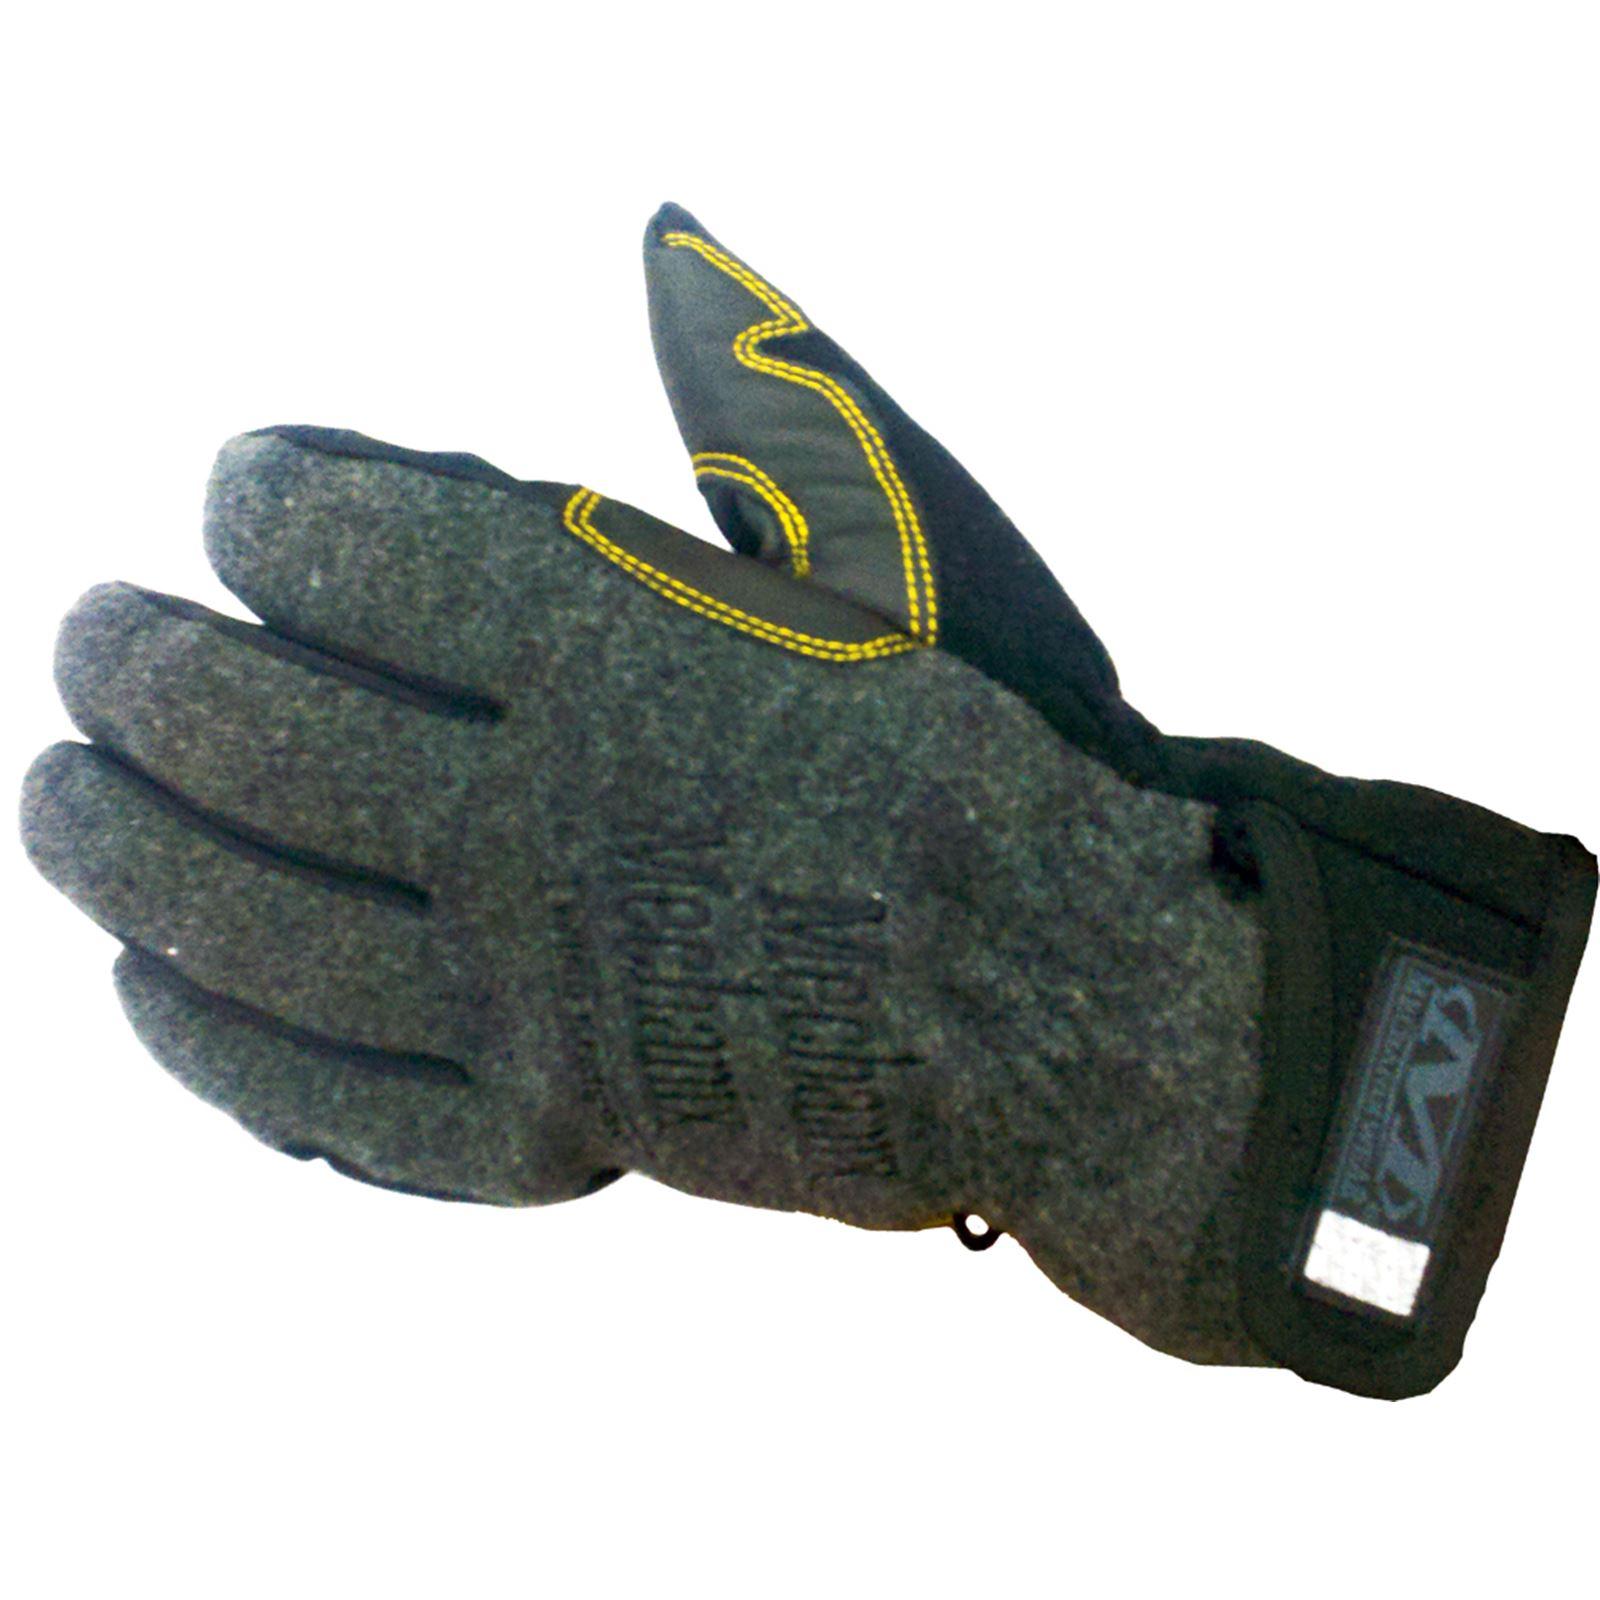 Mechanix Cold Weather Gloves